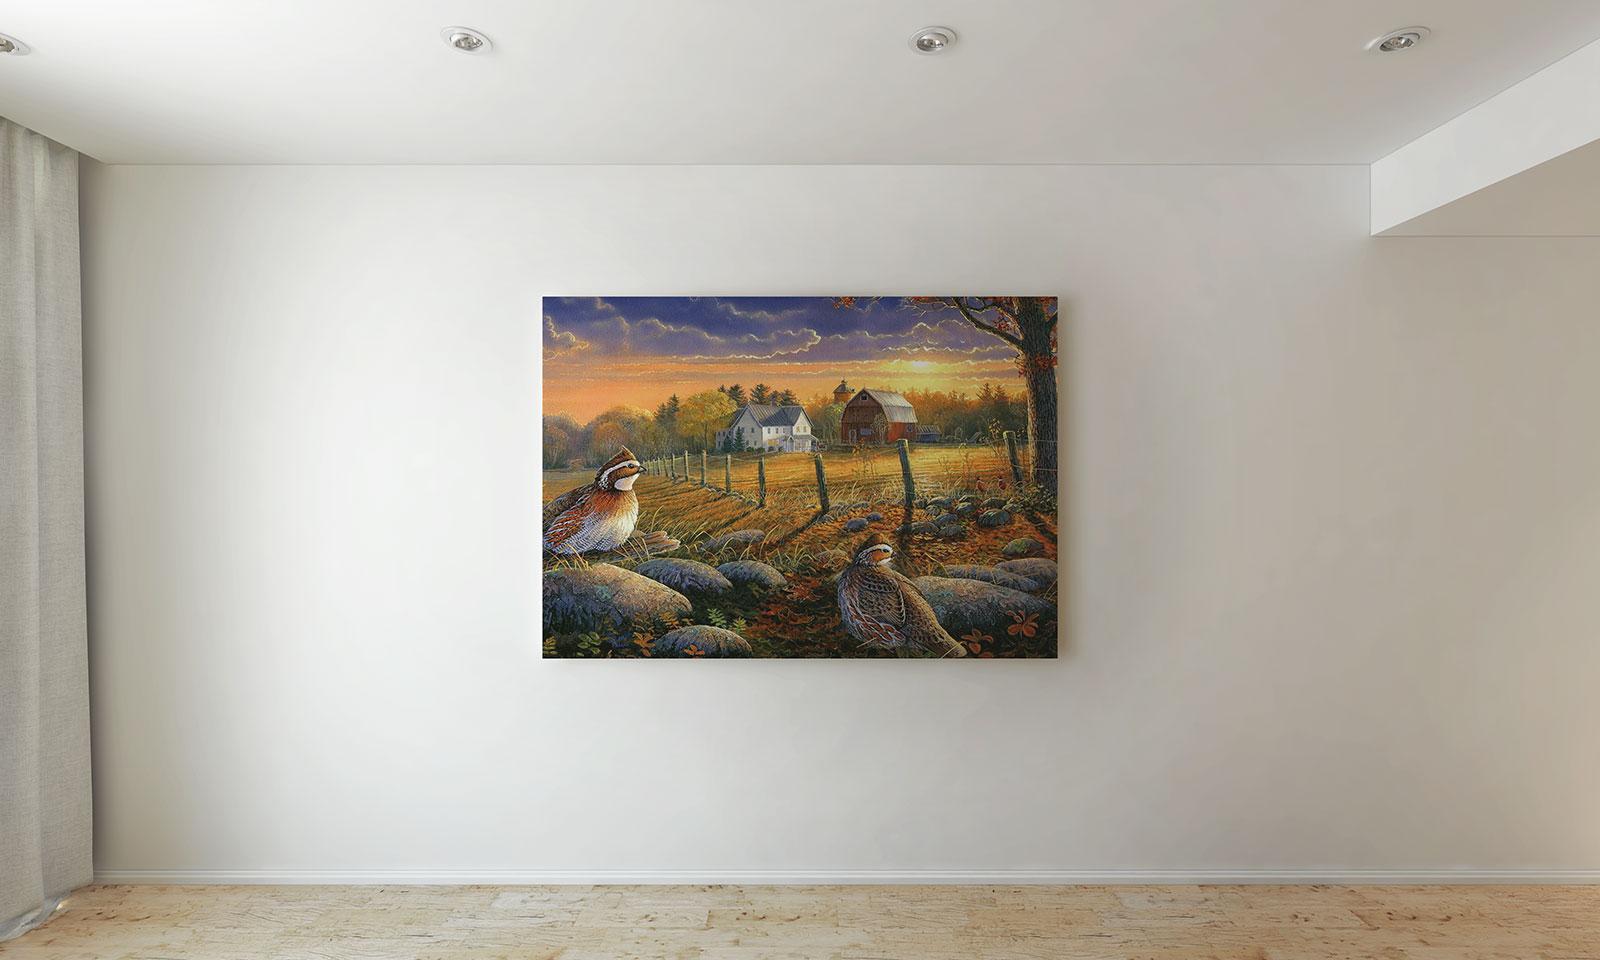 Free Wall Painting Canvas Photo Frame Mockup Psd Good